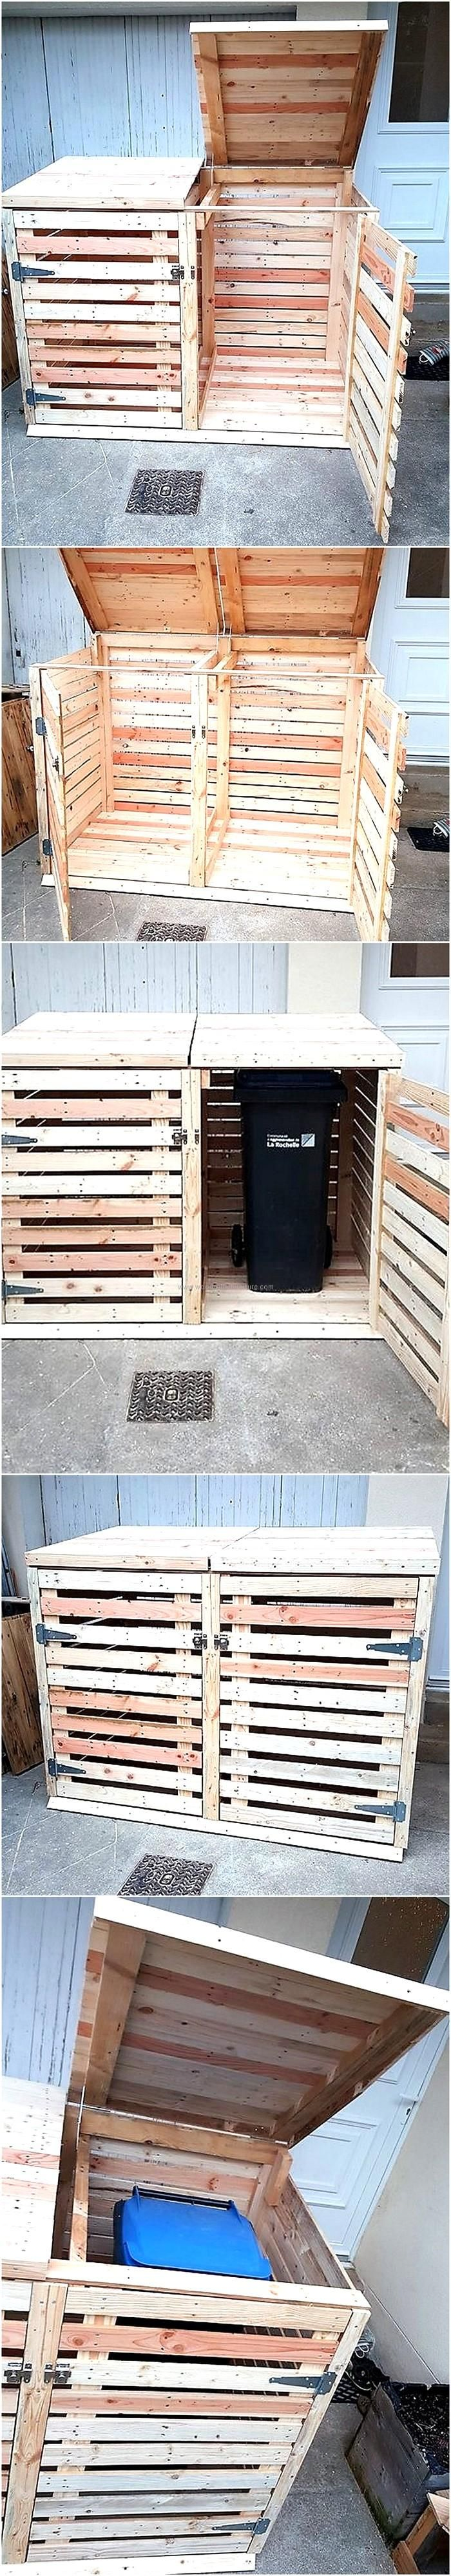 Repurposed Wood Pallet Trash Can Cover Box. Pallet CraftsDiy ...